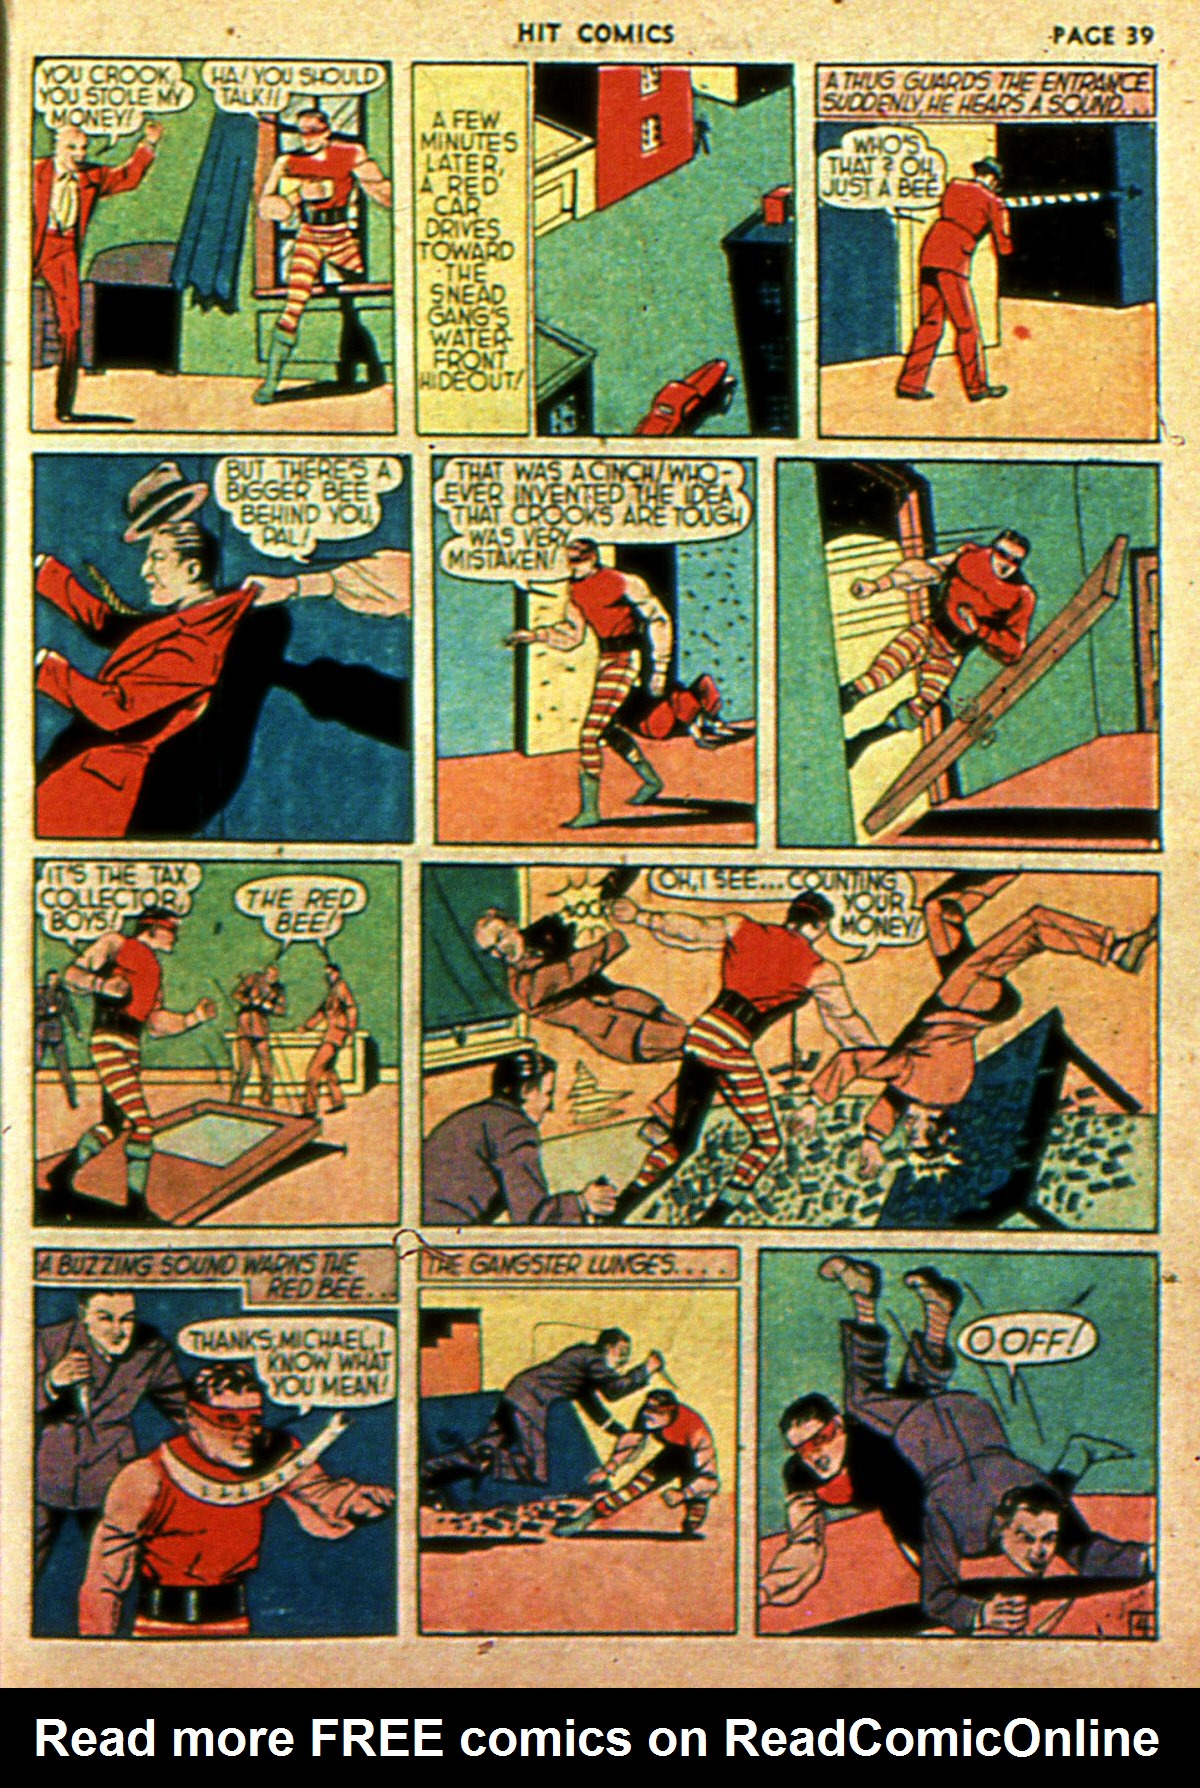 Read online Hit Comics comic -  Issue #2 - 41